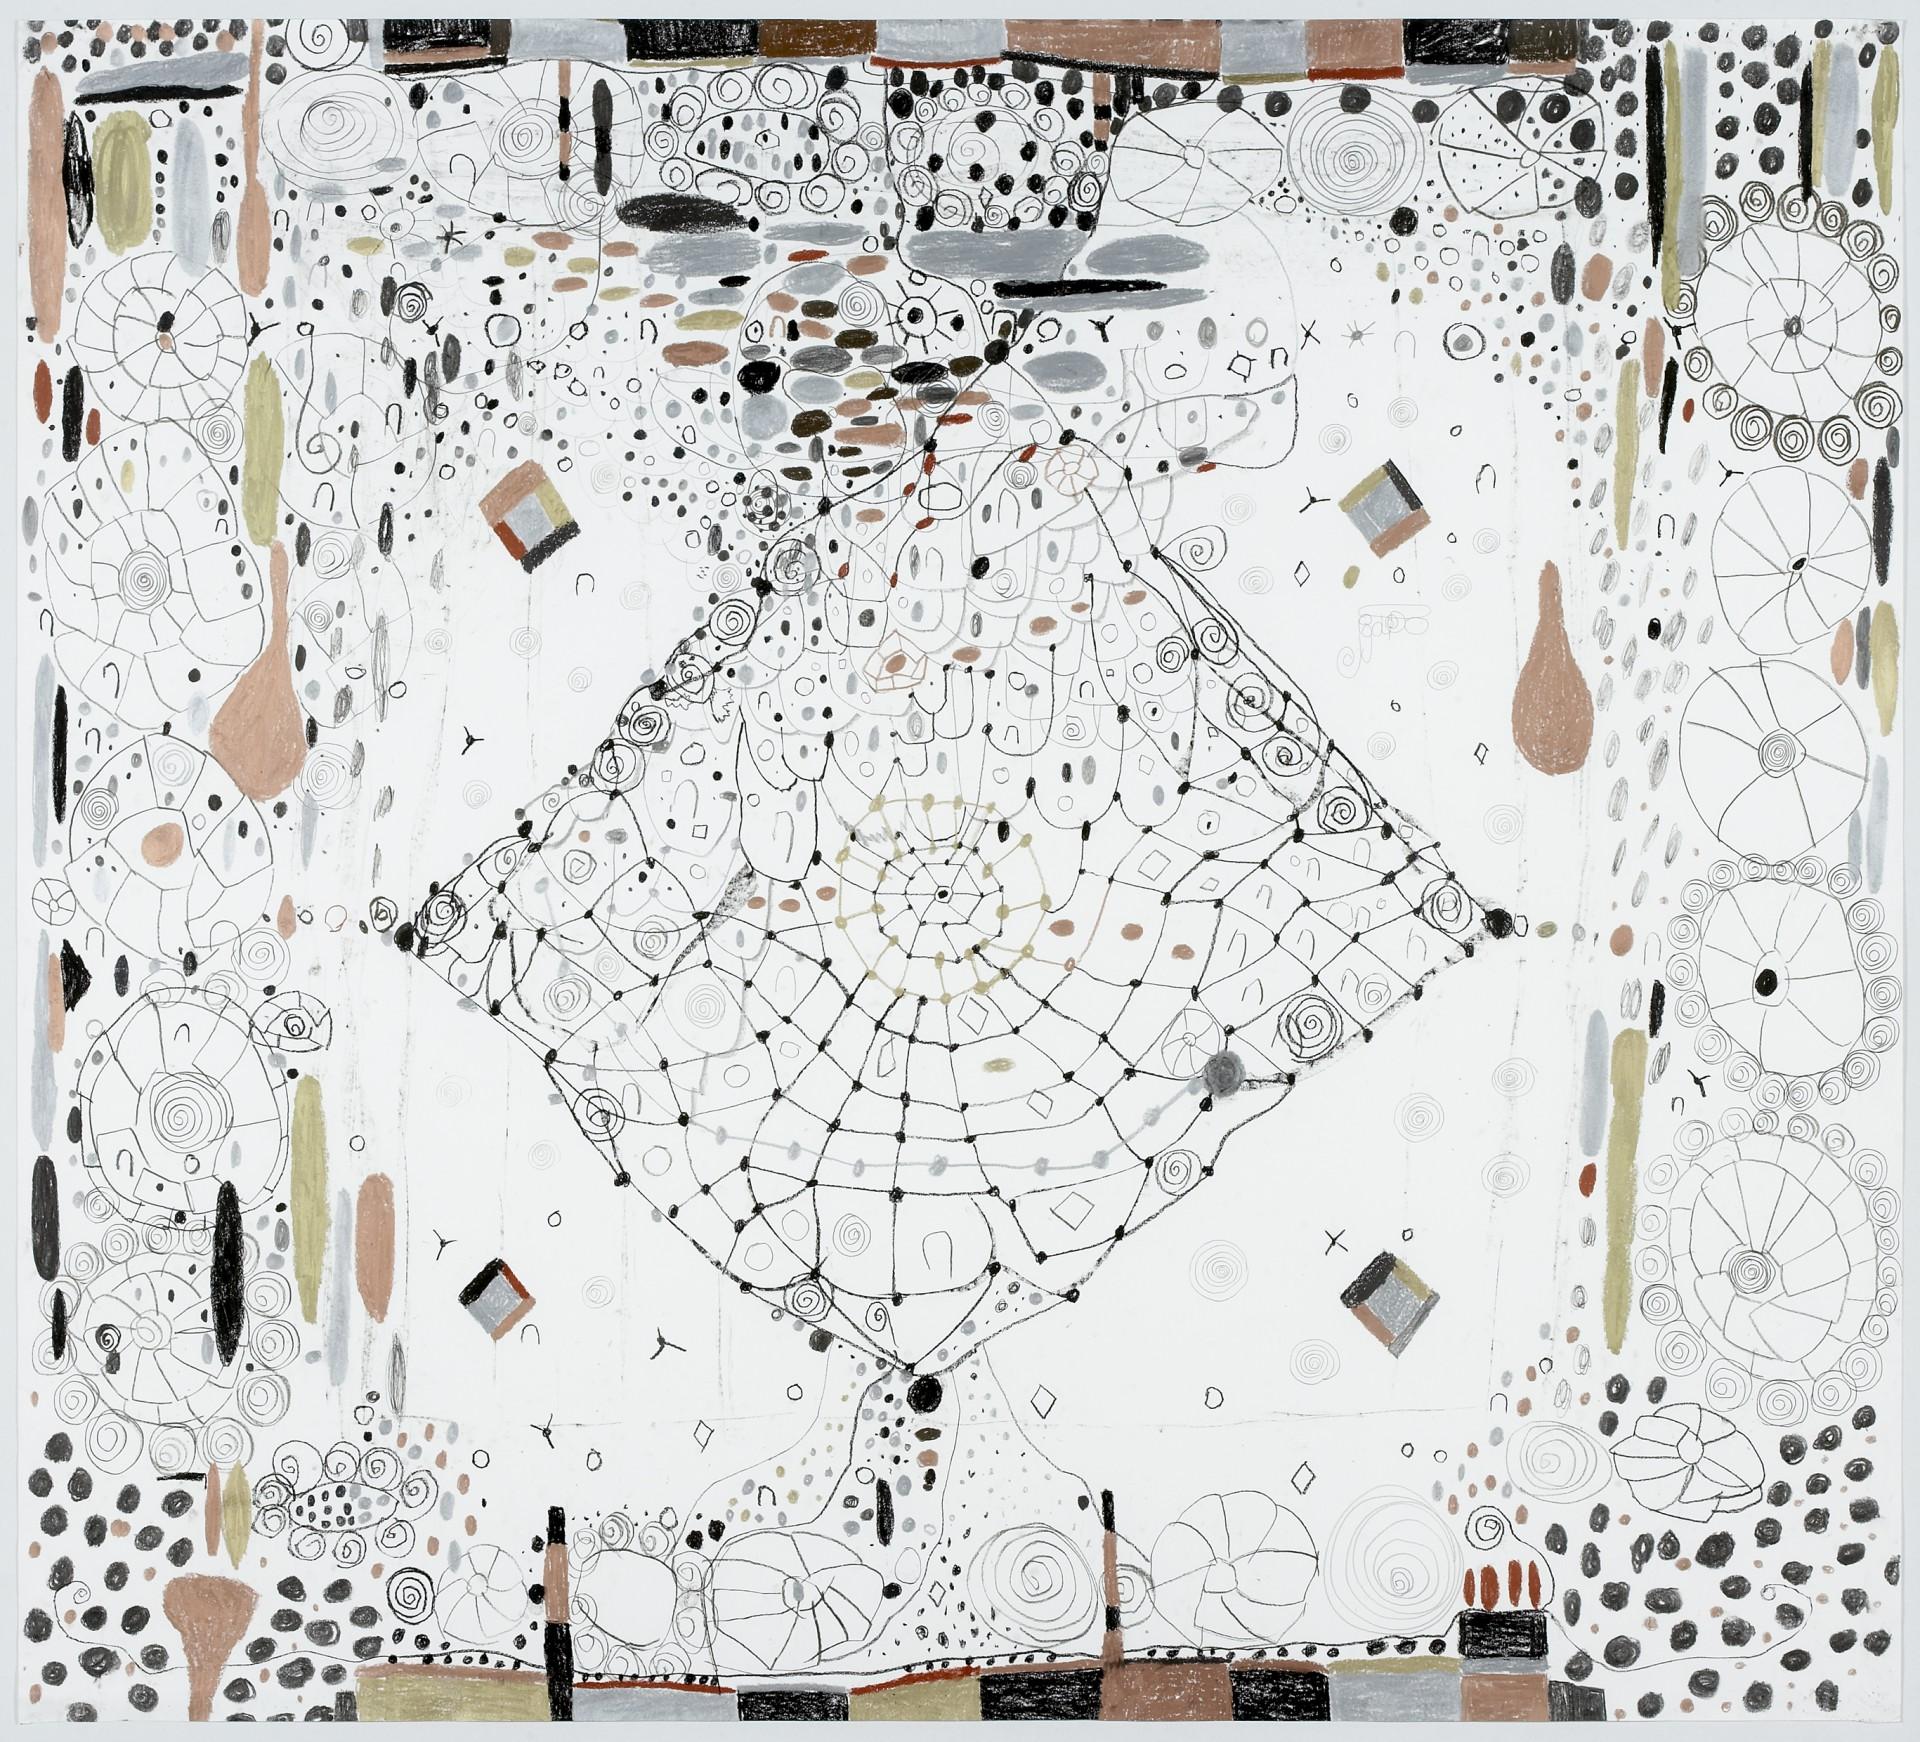 Kirstine Vaaben <i>Labyrinter, Kunstens Rum,</i> Charlottenborg 2005